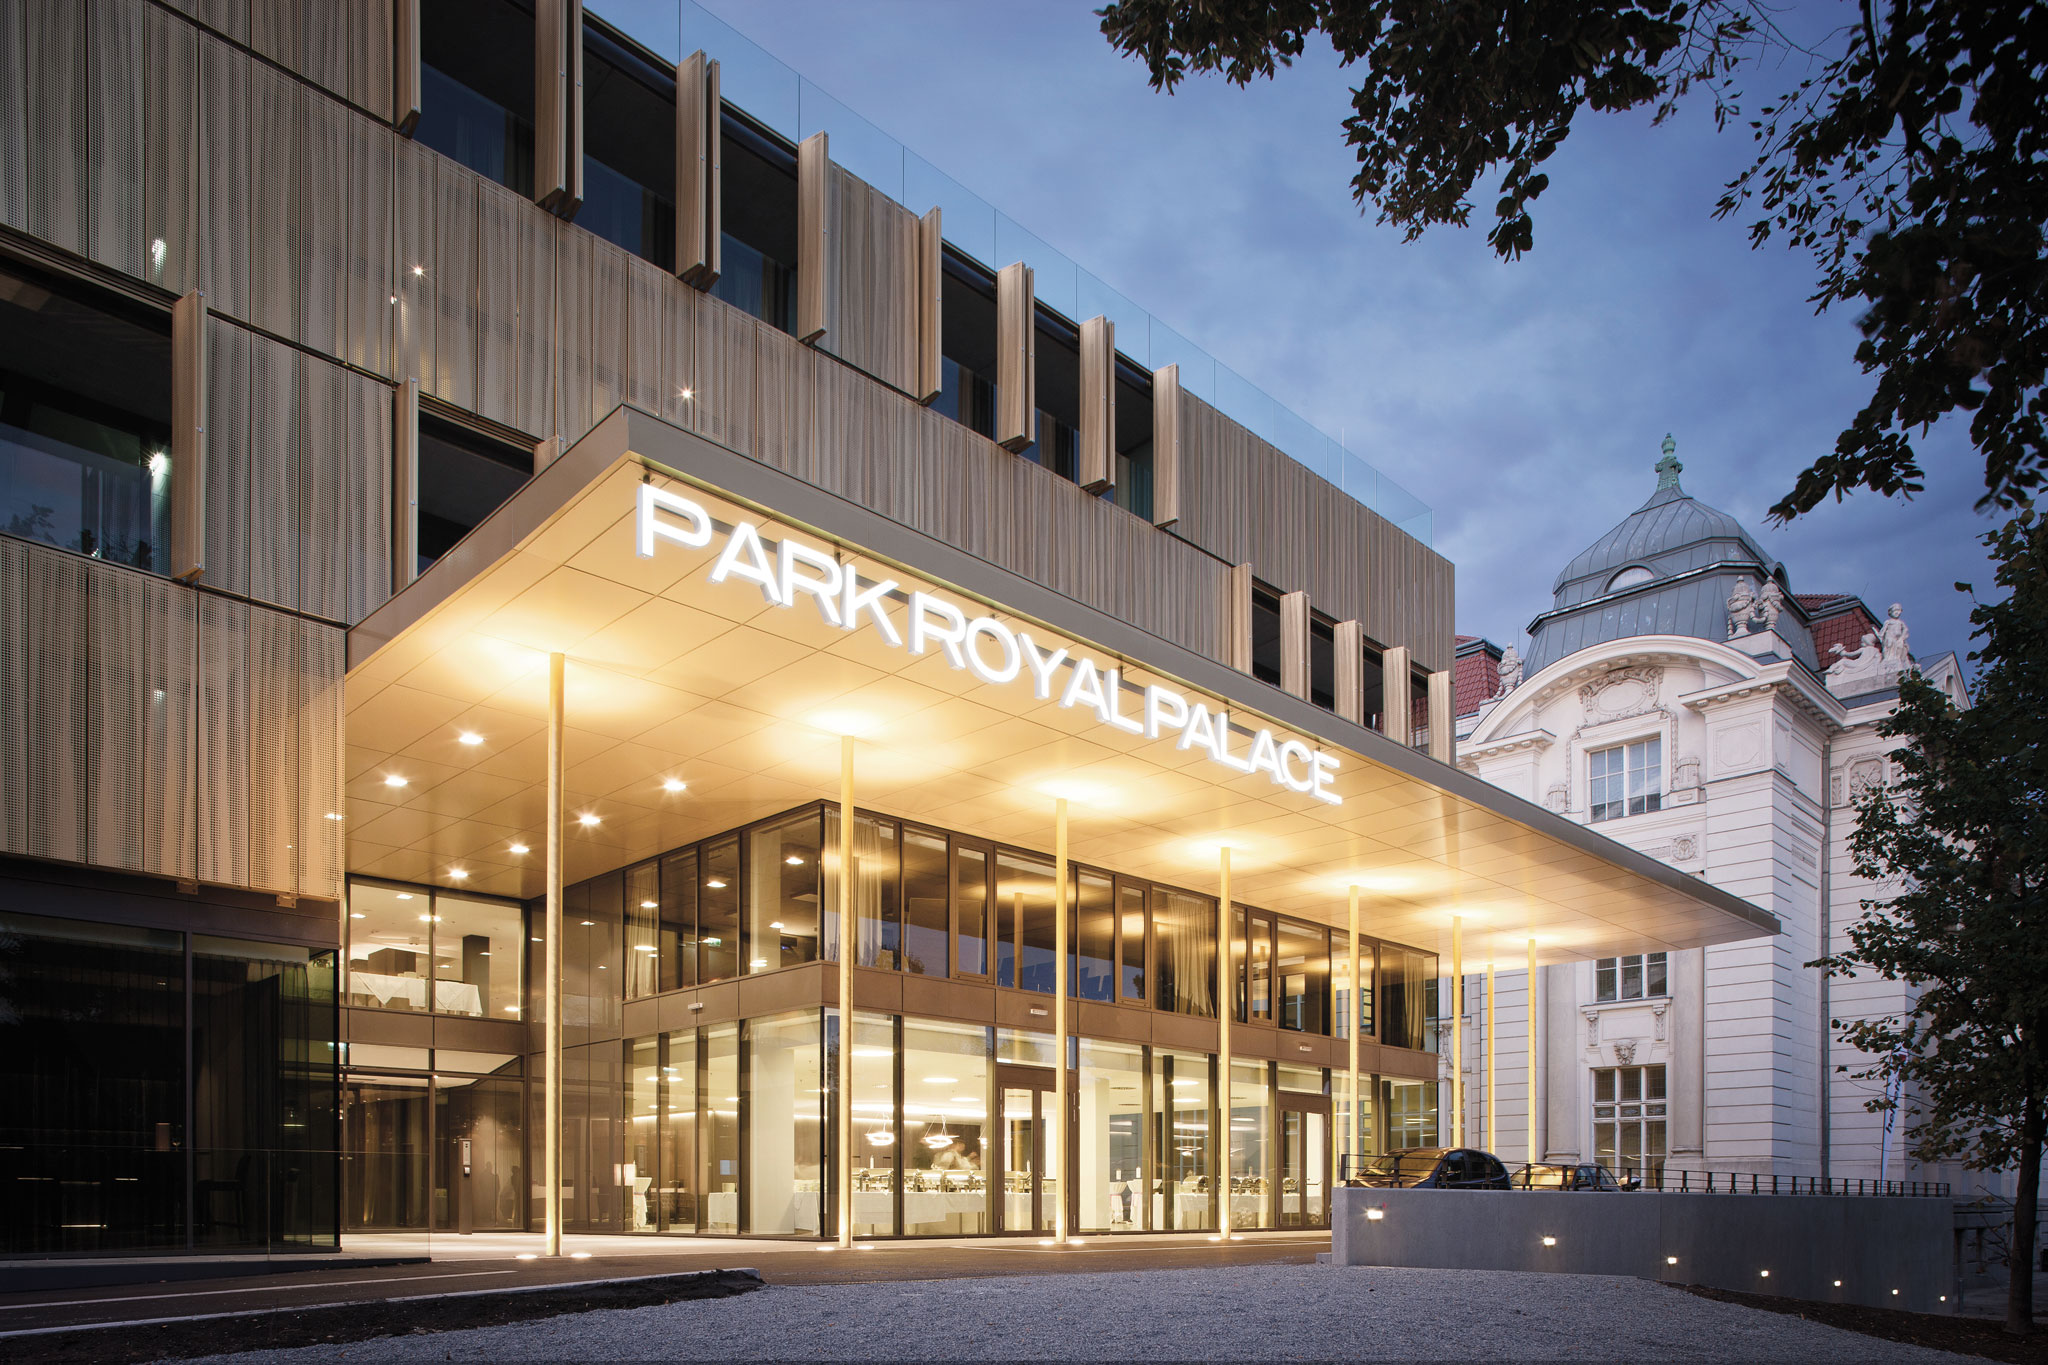 Radisson Blu Park Royal Palace Hotel